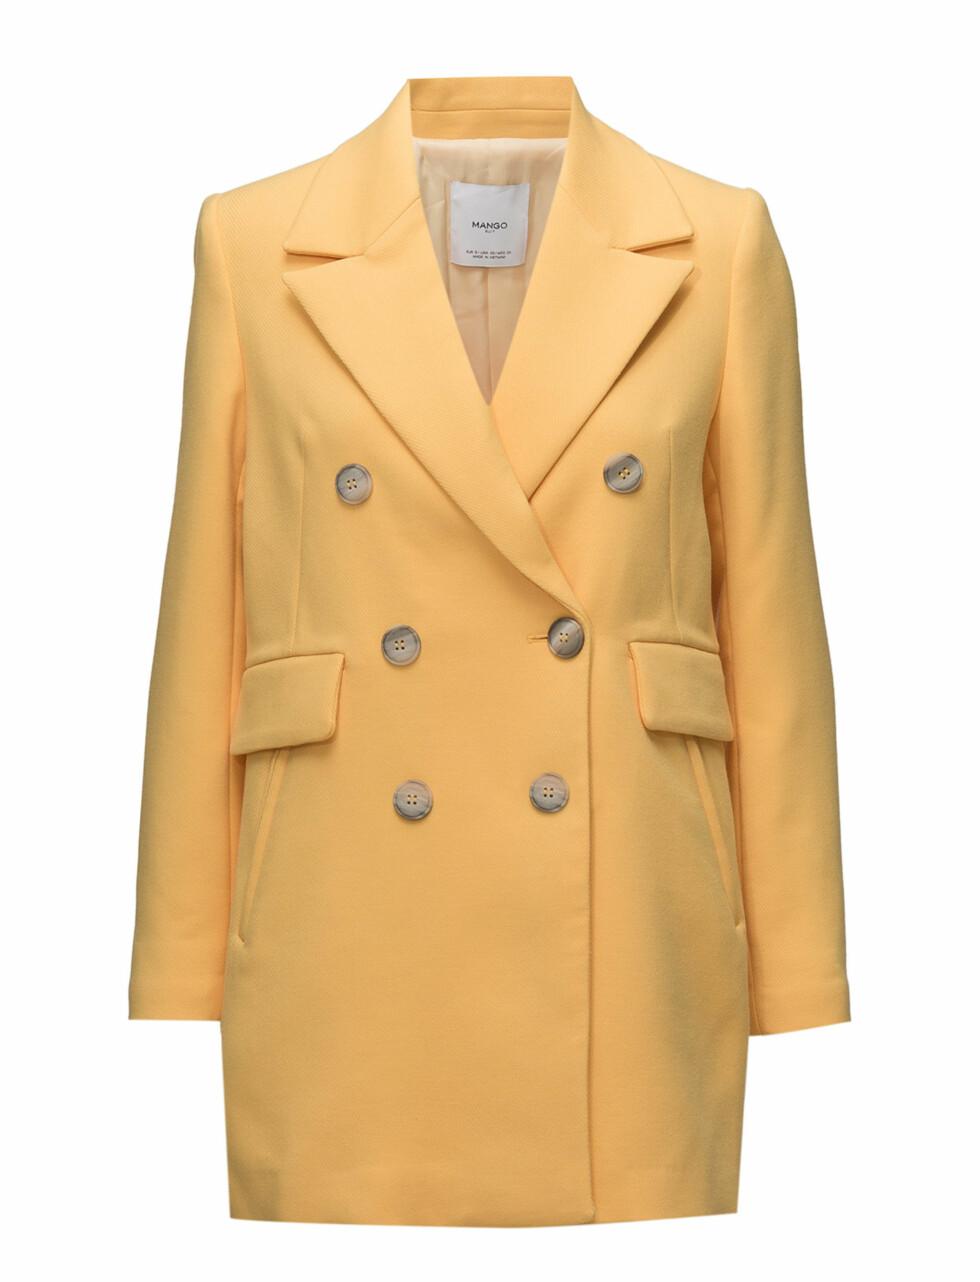 Jakke fra Mango  700,-  https://www.boozt.com/se/sv/mango/contrast-buttons-coat_17421350/17421351?navId=67378&group=listing&position=1000000